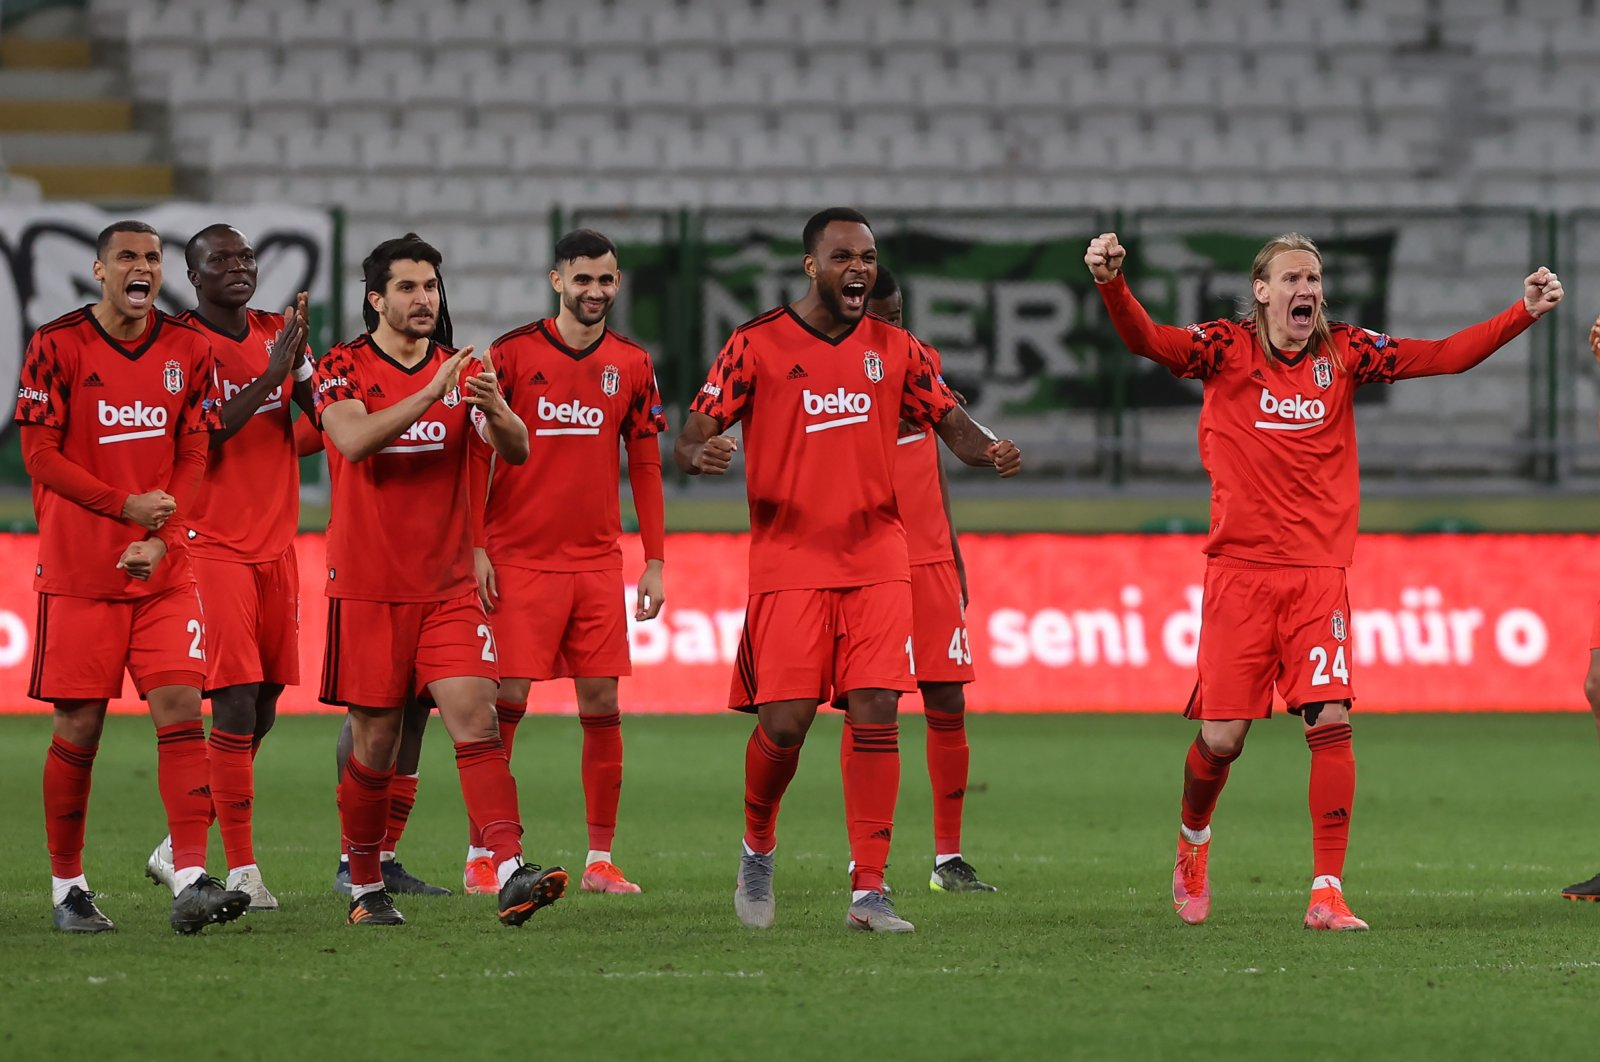 Beşiktaş players celebrate after a goal during the penalty shoot-out of their Ziraat Turkish Cup quarterfinals match in Konya, Turkey, Feb. 11, 2021 (AA Photo)